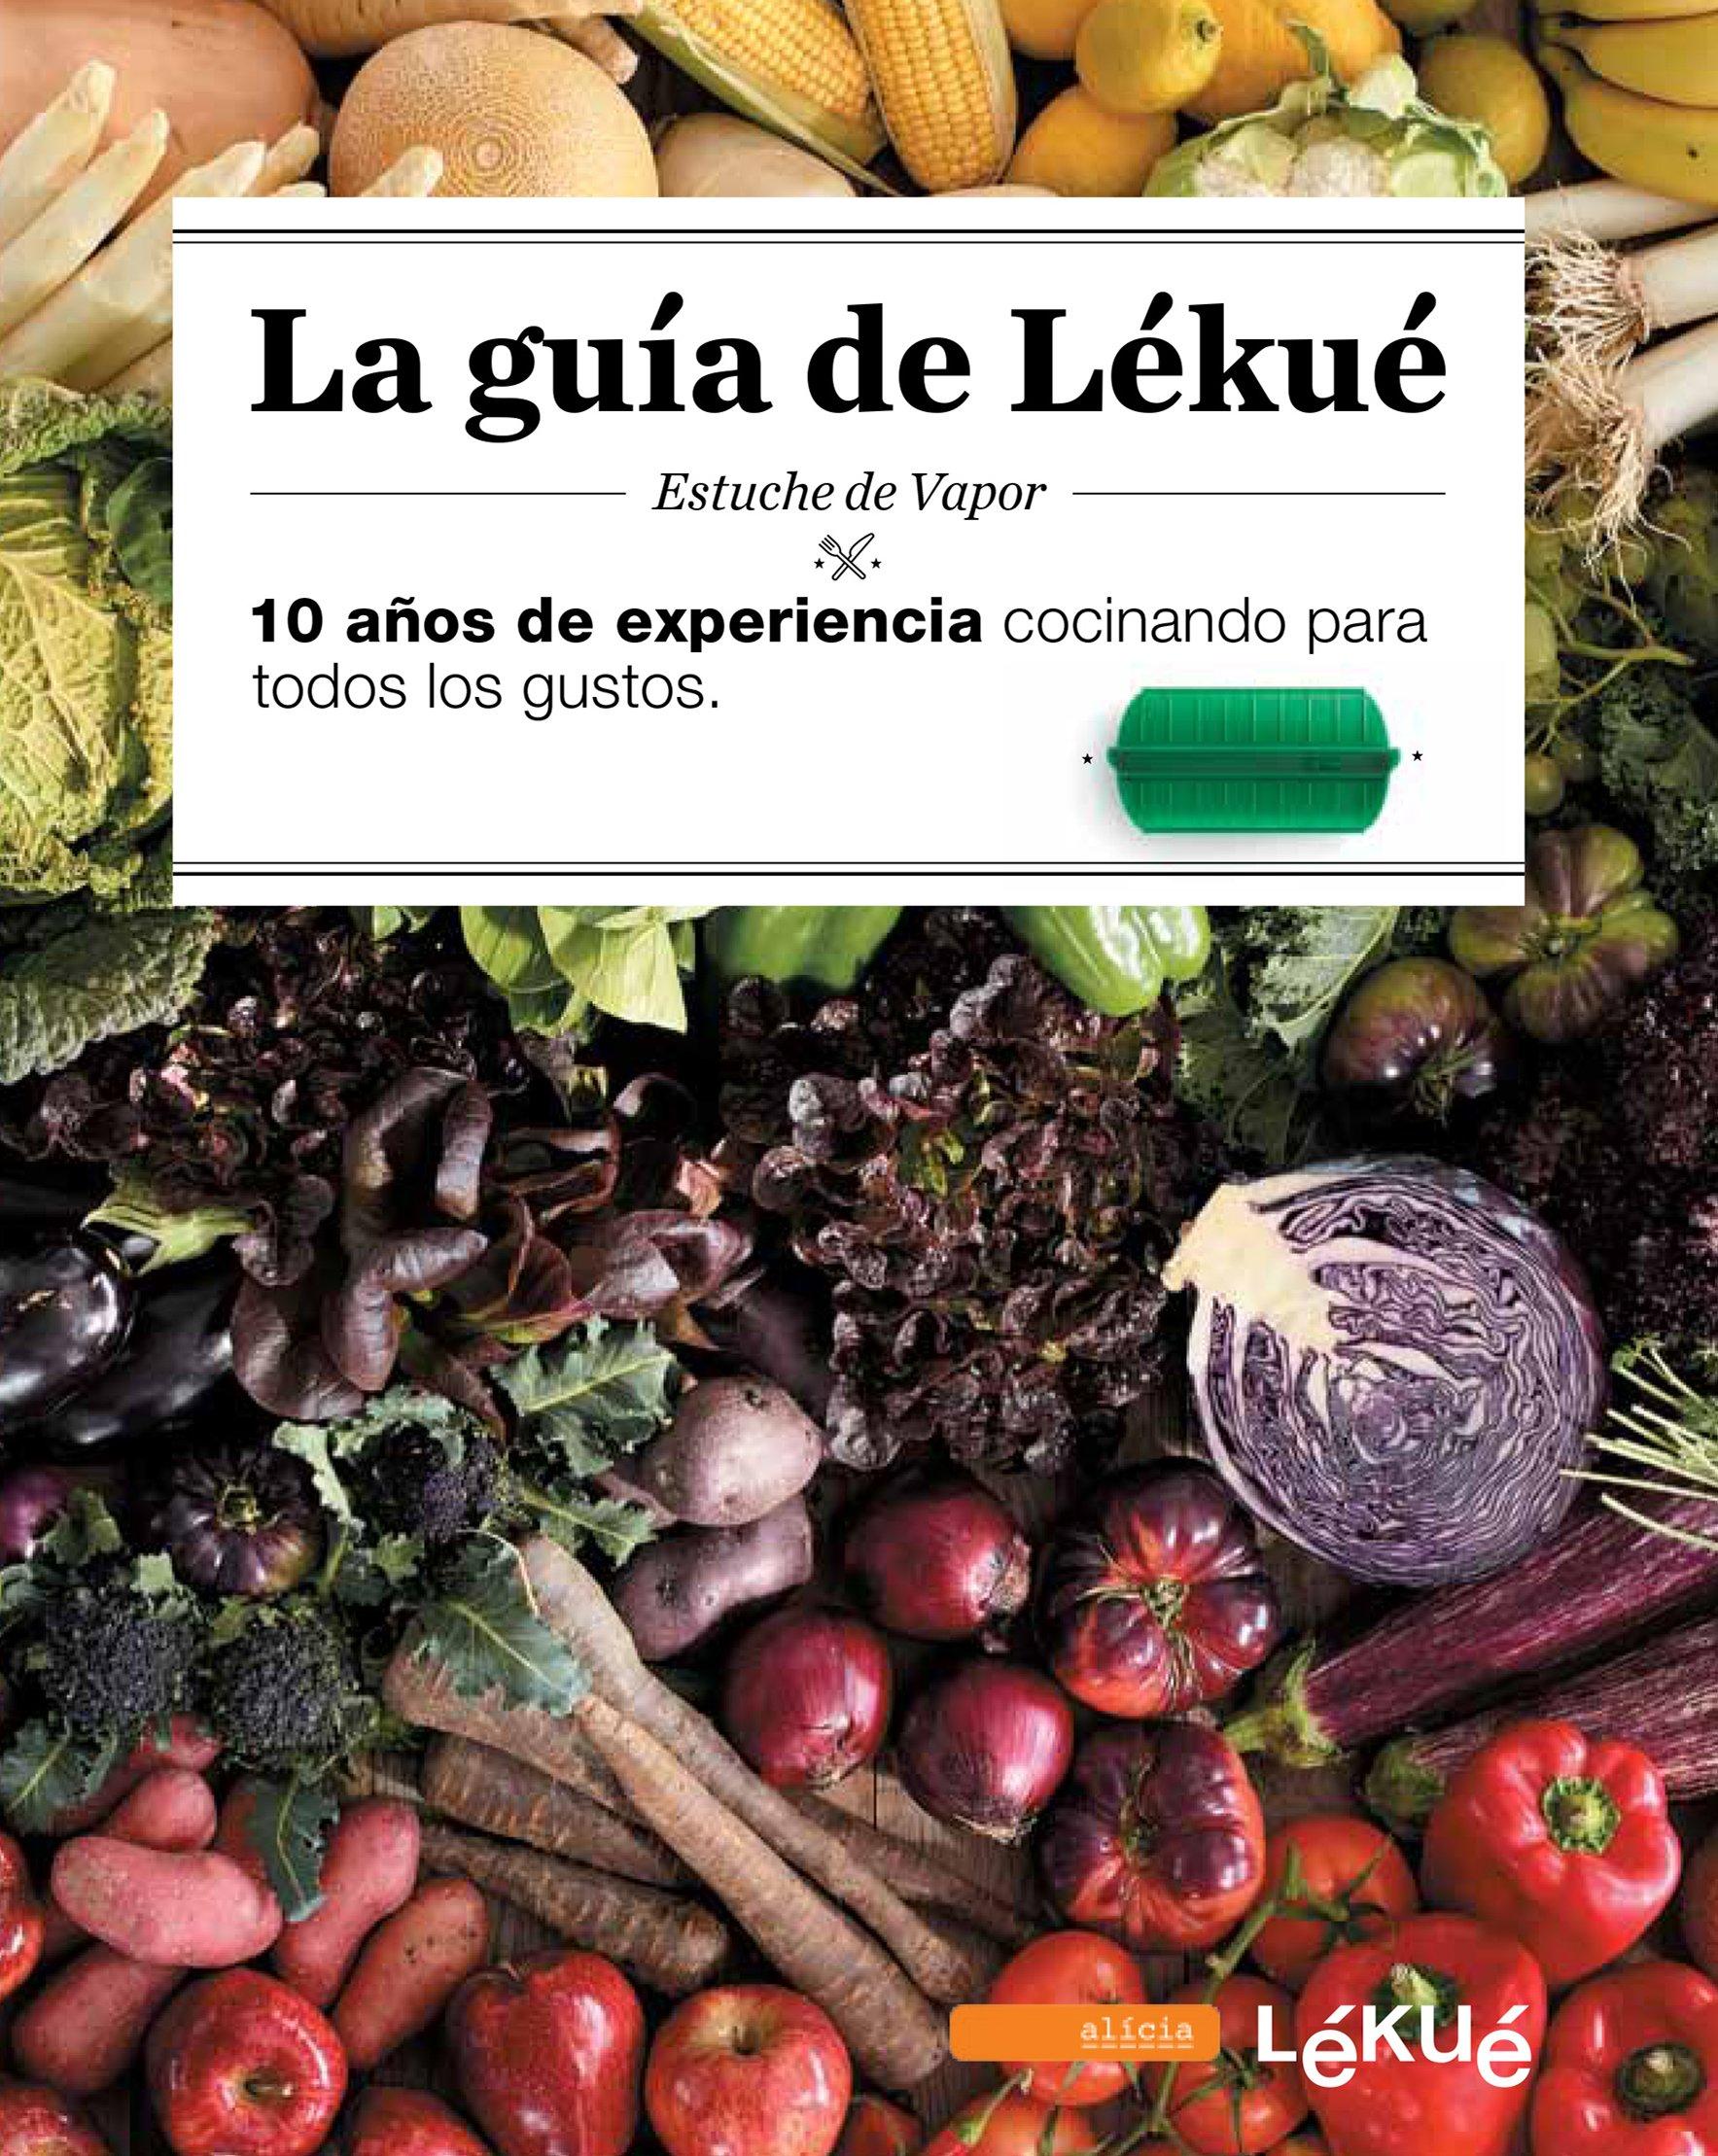 Lékué Libro LA GUIA ESP, Negro, Único: Amazon.es: Lékué y Fundación Alicia, Lékué y Fundación Alicia: Libros